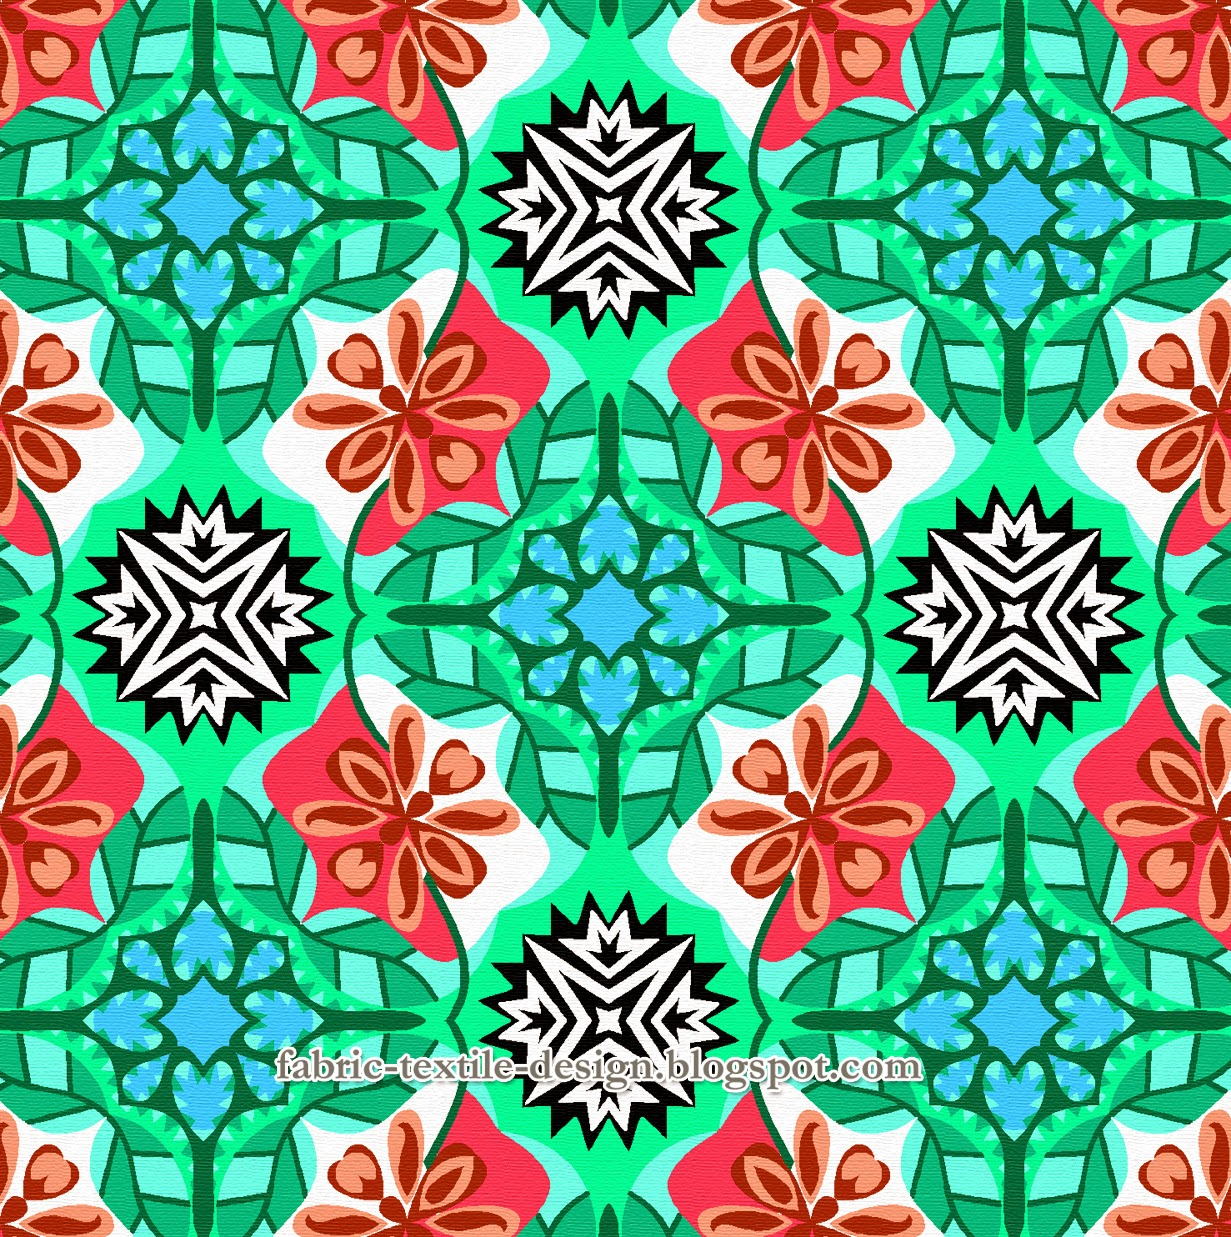 Textile designing in faisalabad fabrics designs in for Design couchtisch fabric